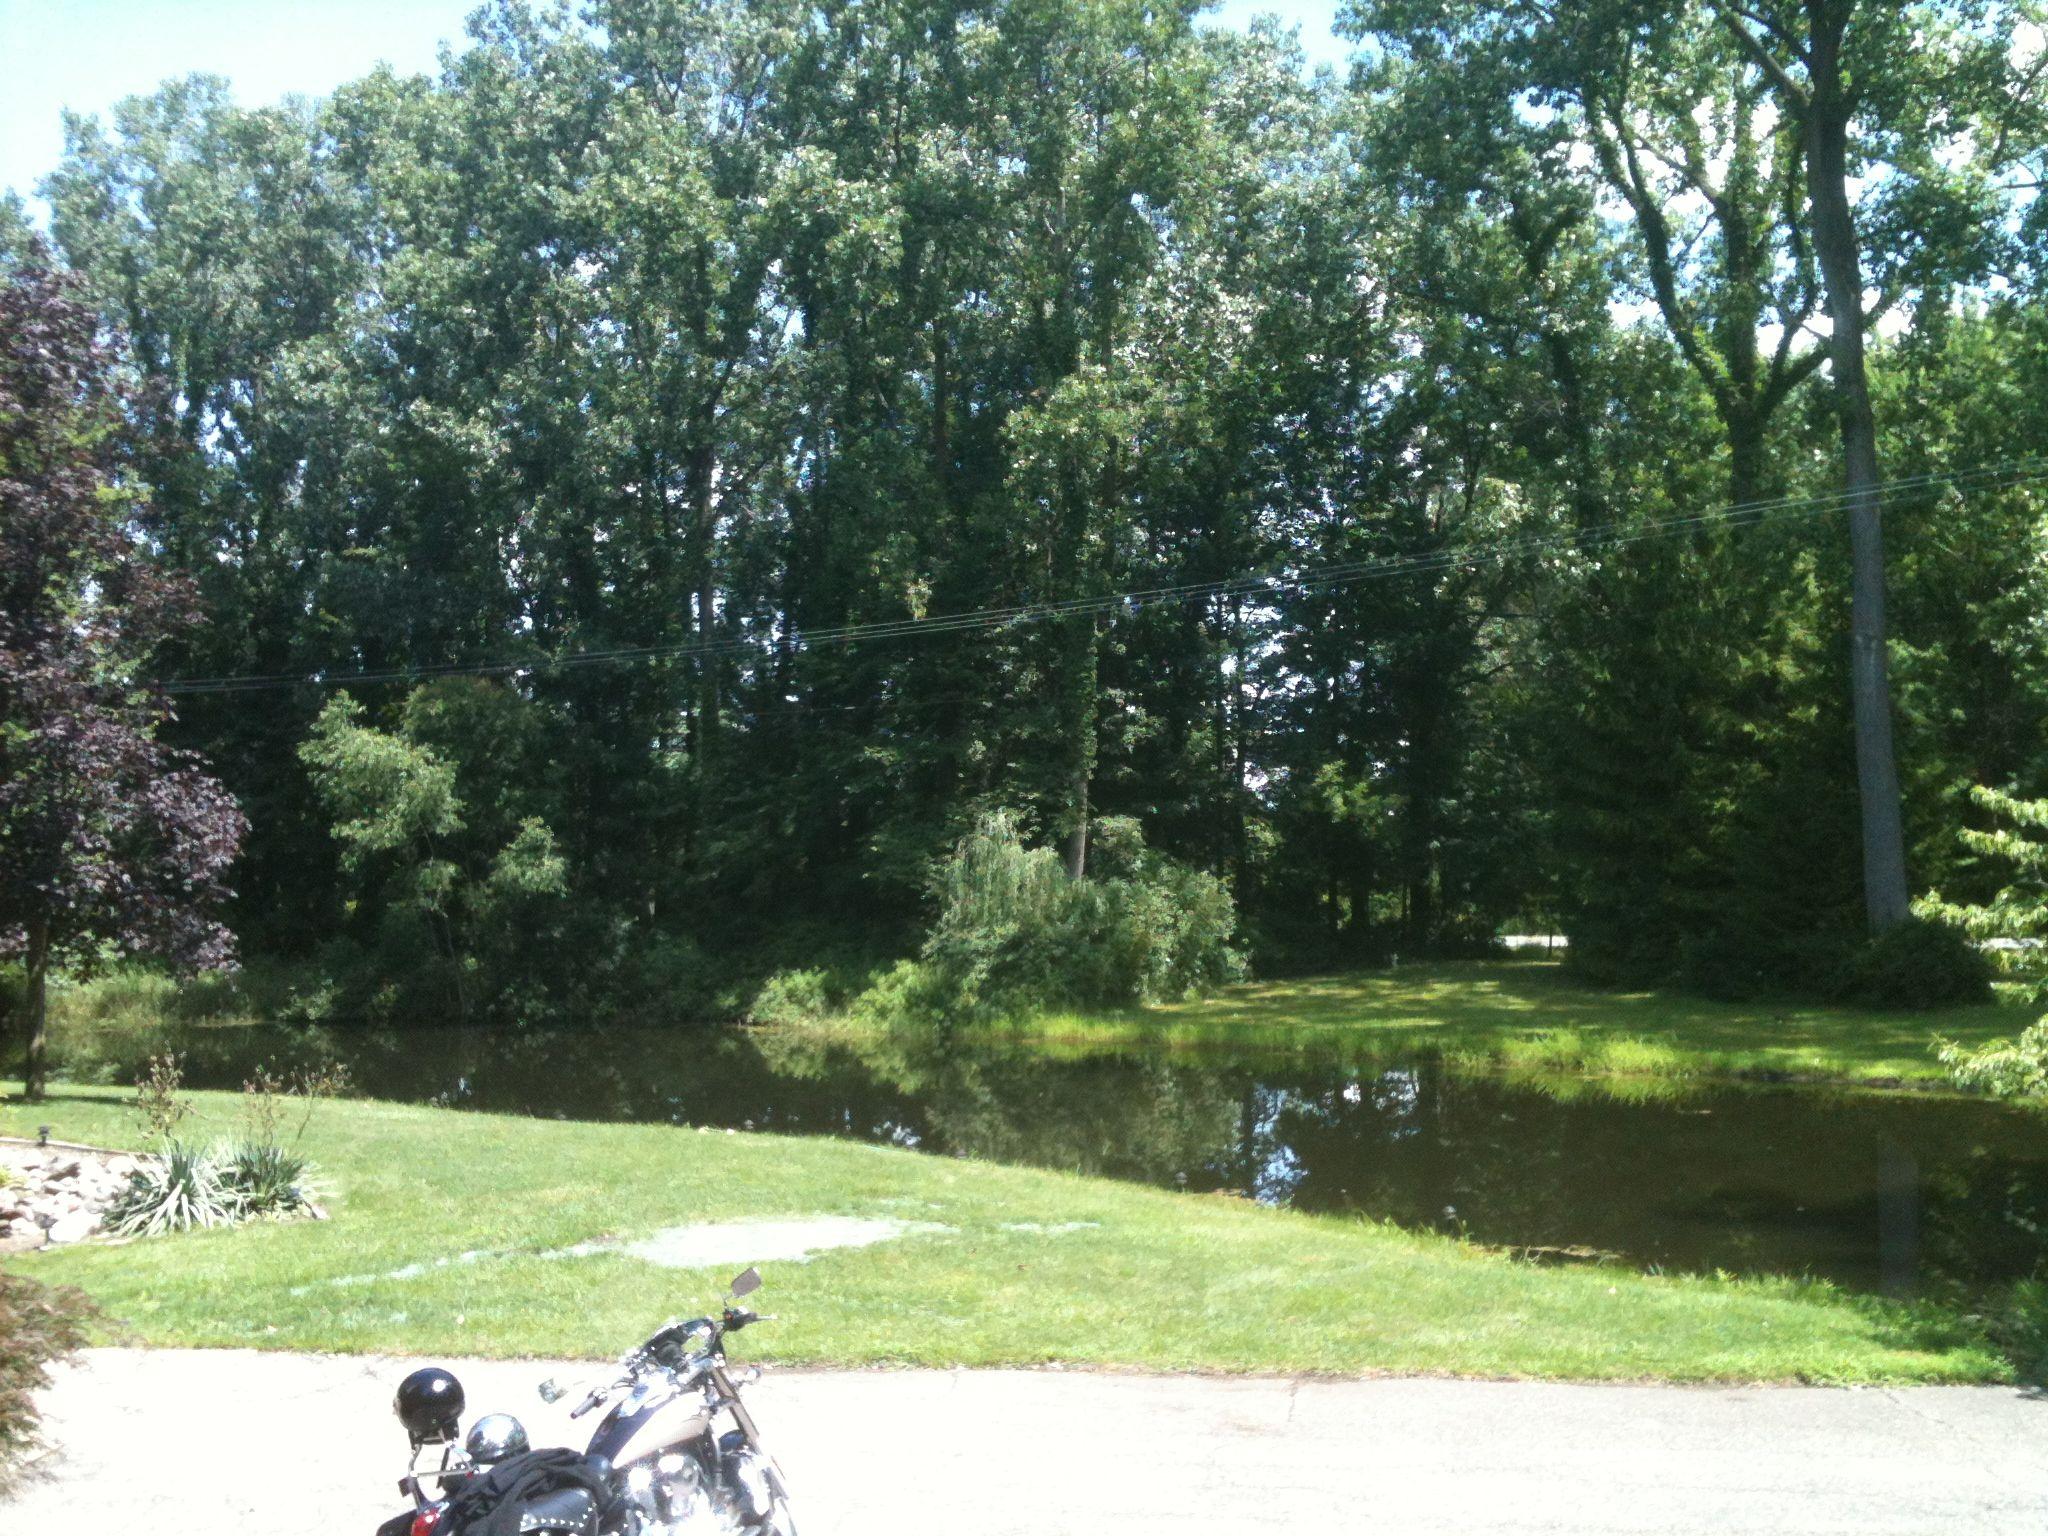 The pond at Scotts Fox